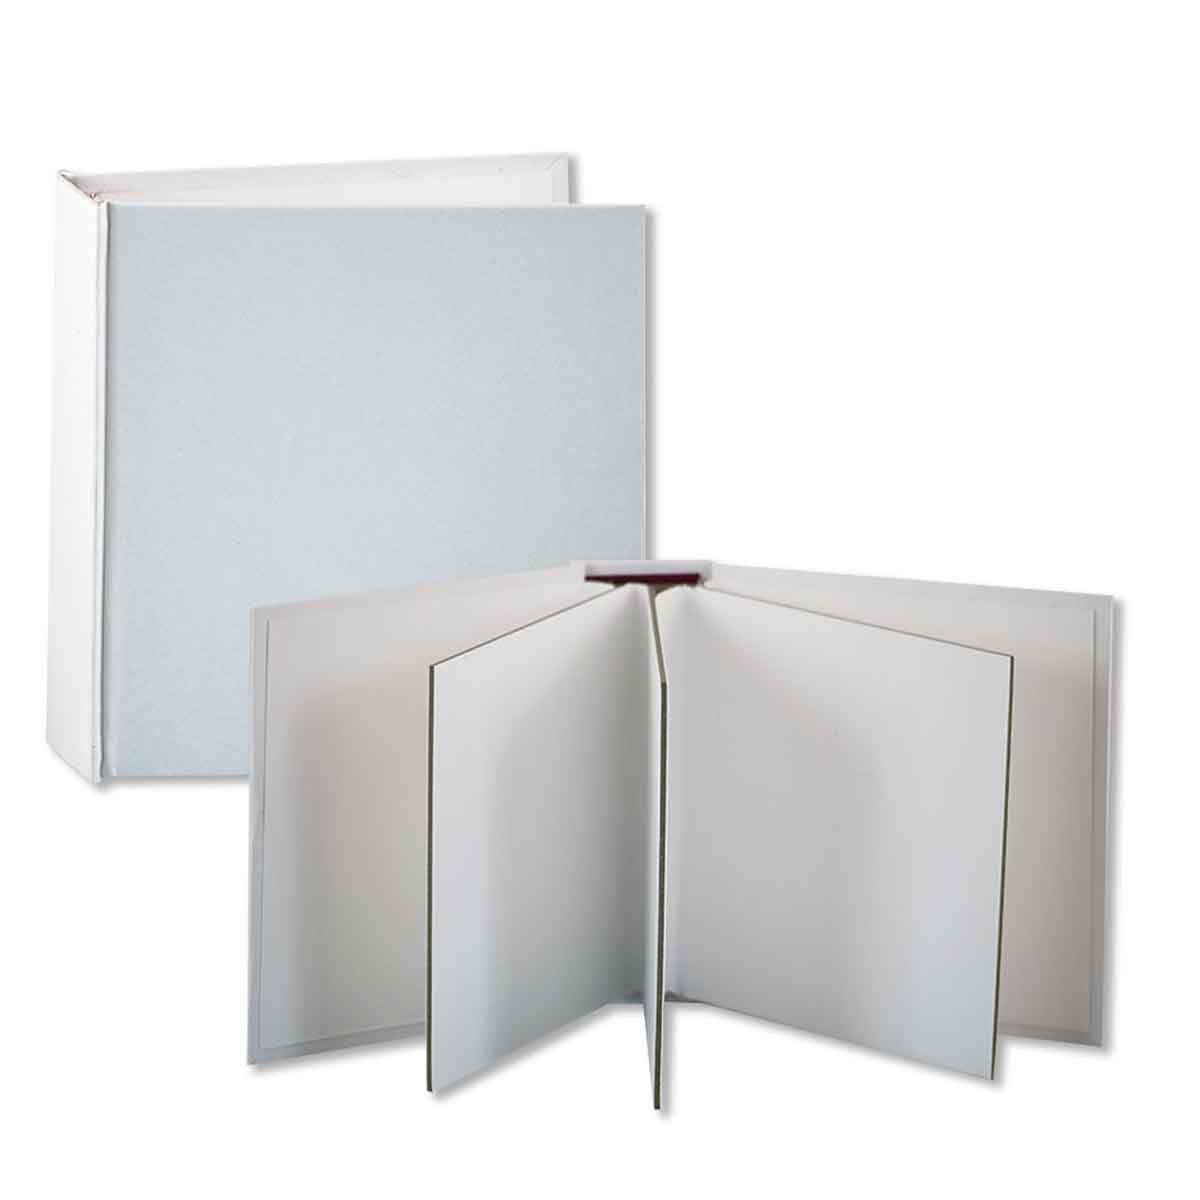 Linea Imagine – Album raccoglitore 16x16cm